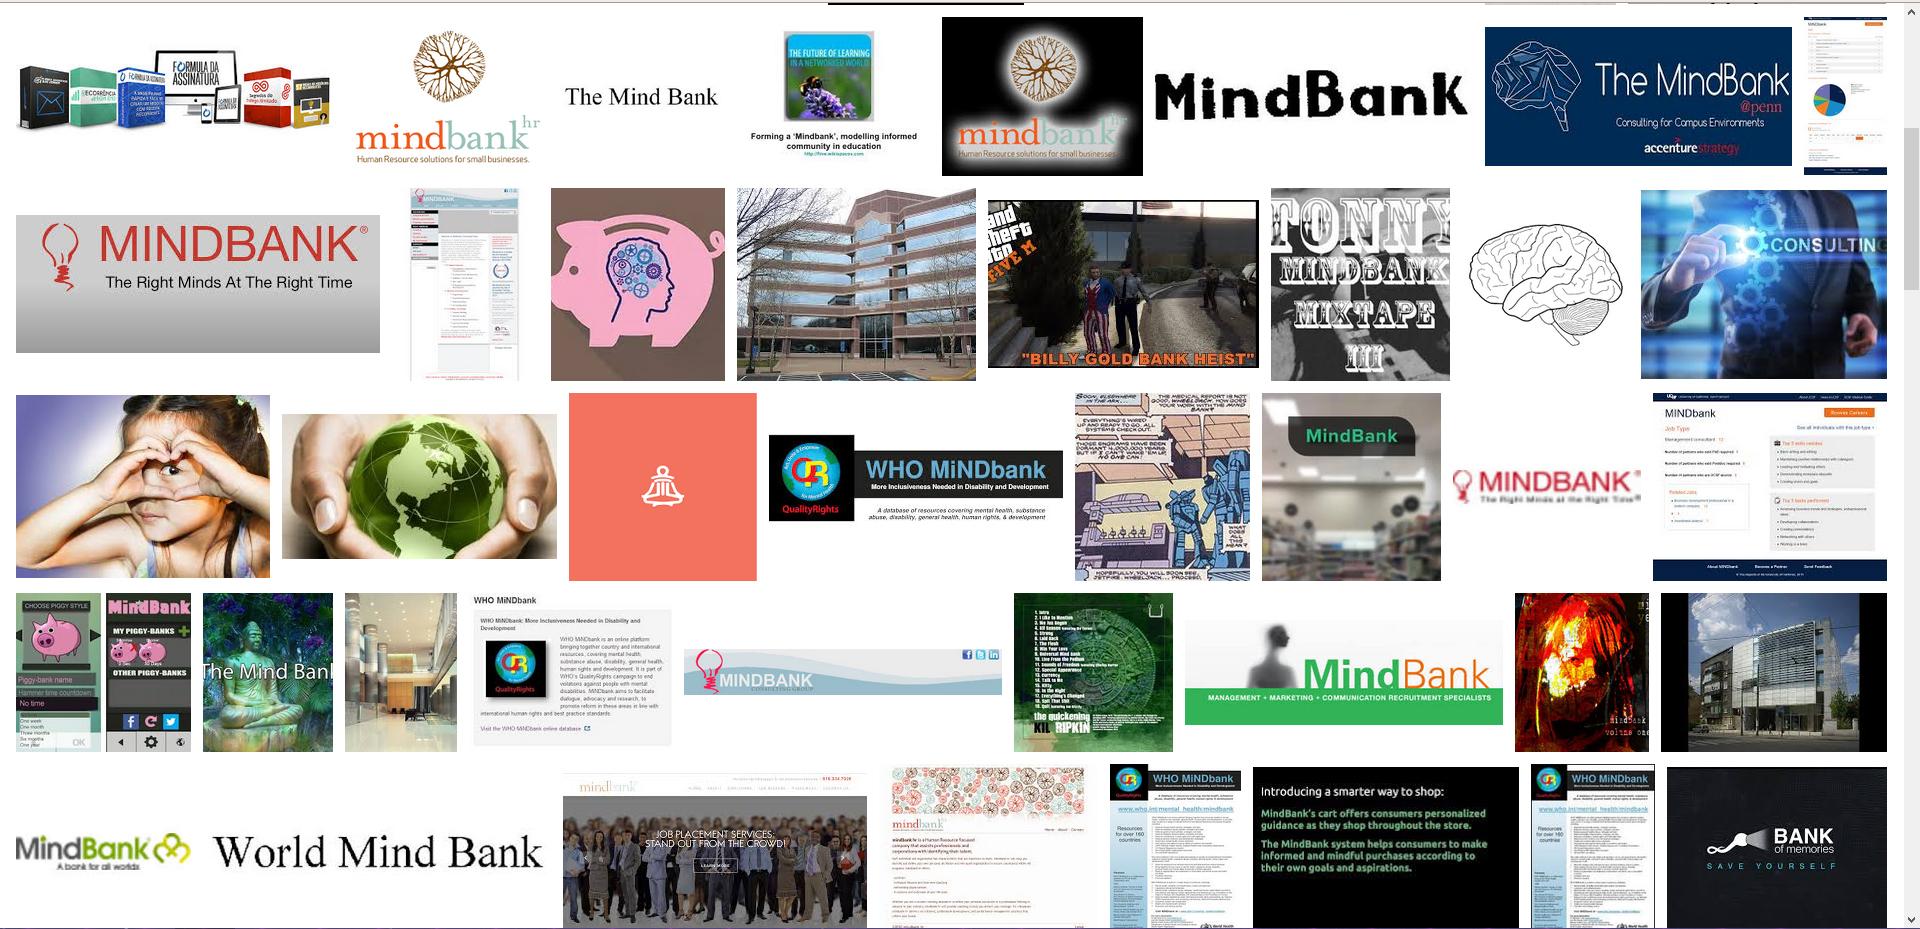 mindbanks2.